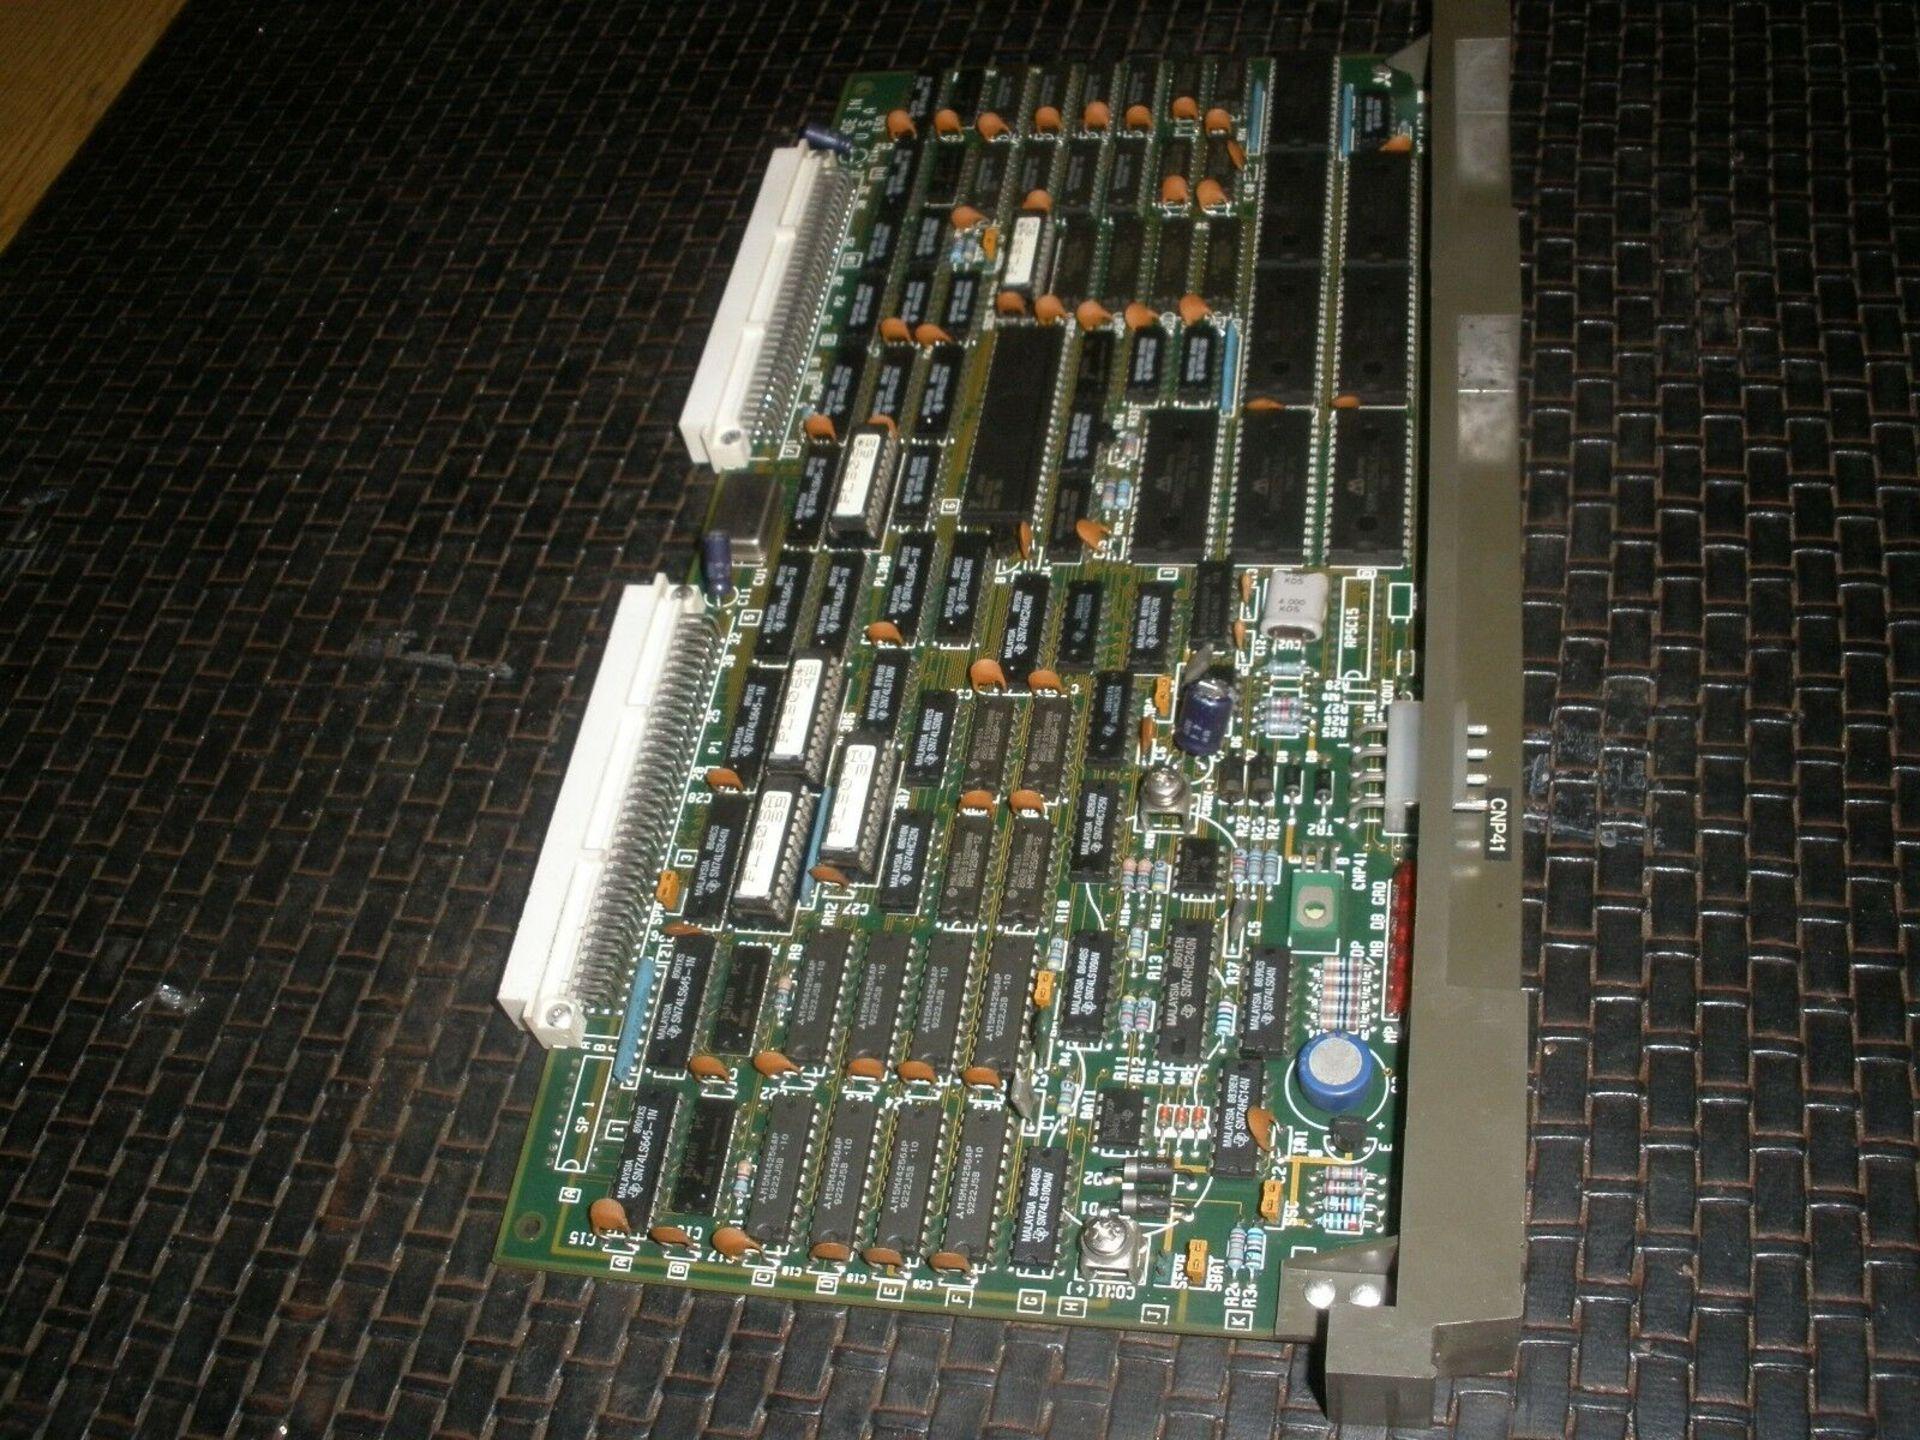 Mitsubishi Servo Board BN624A814G53 Rev A